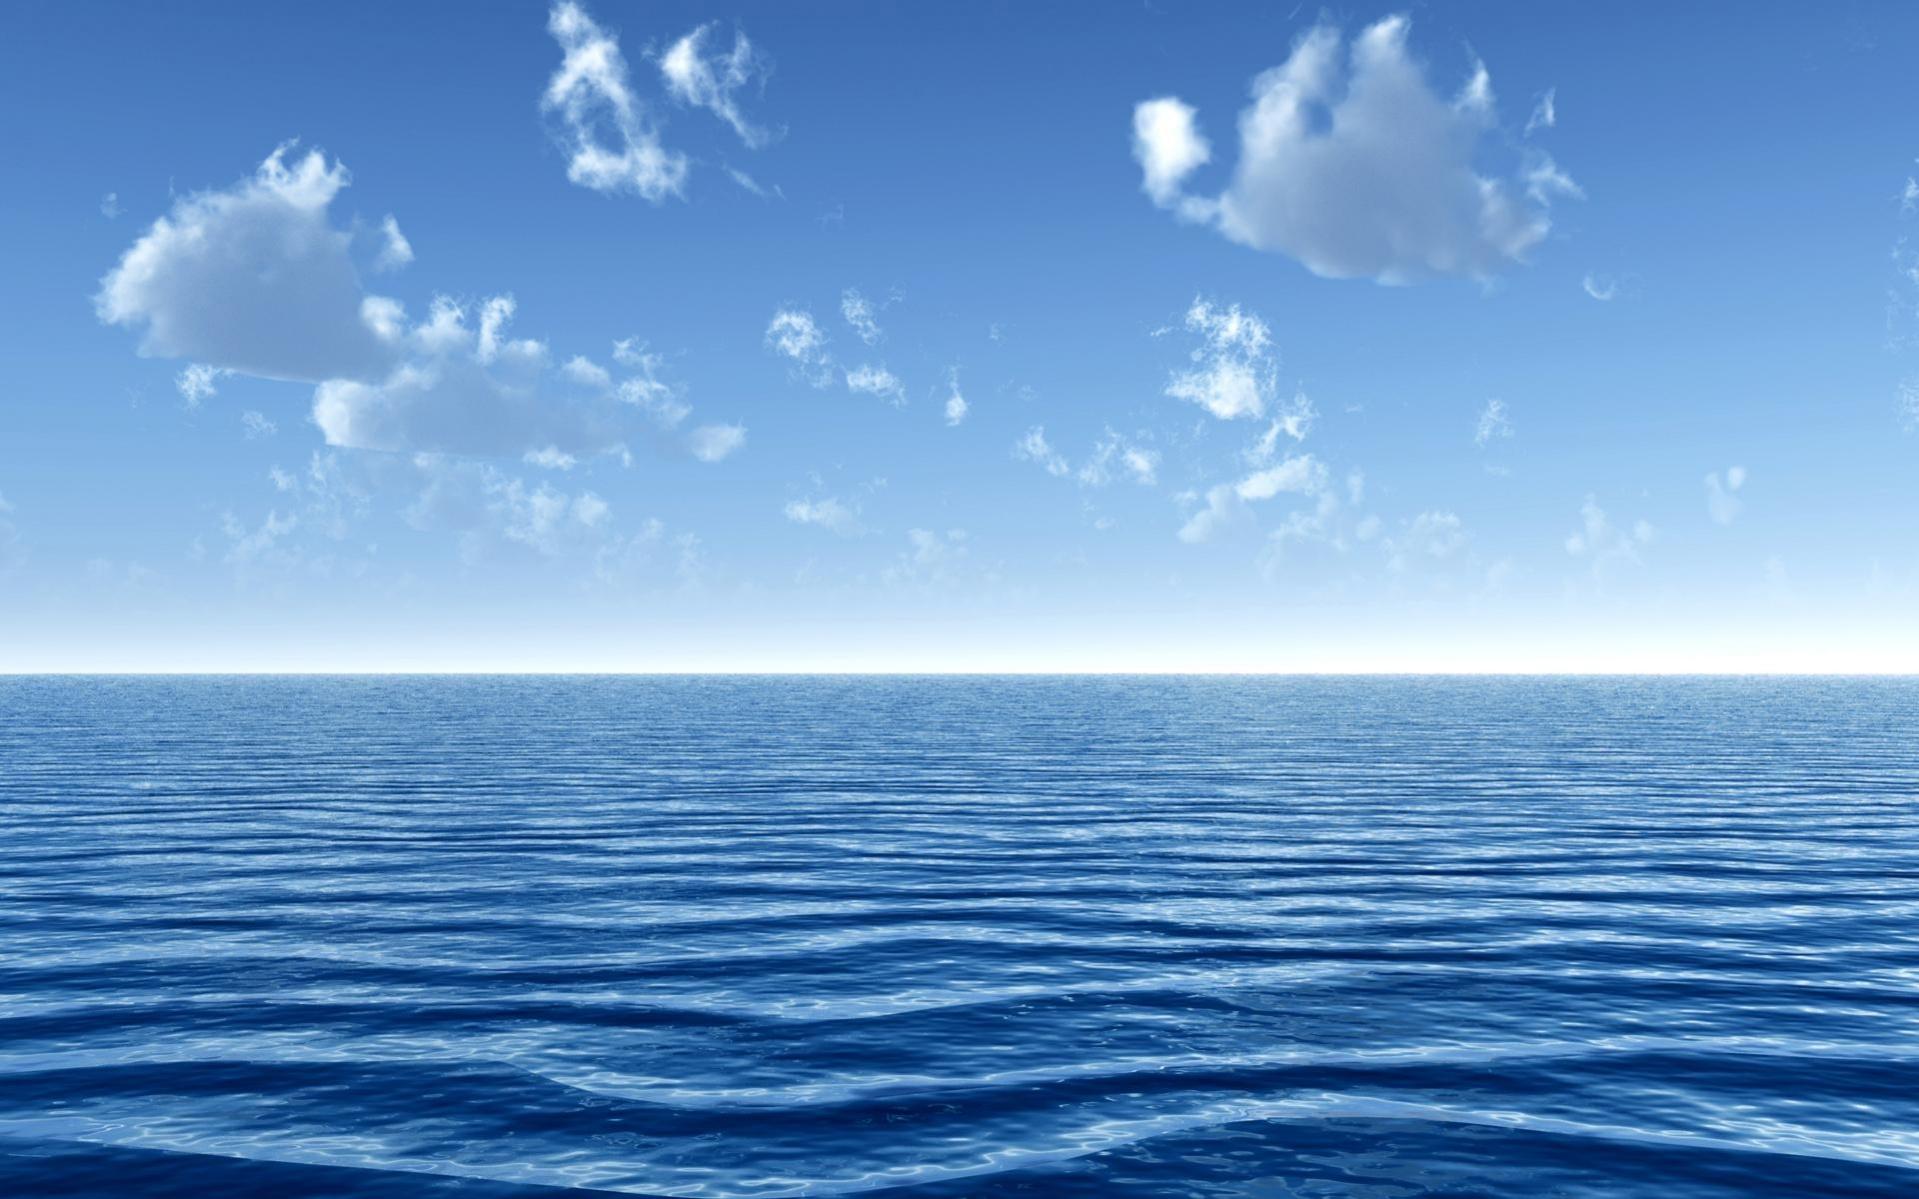 Free HD Ocean Wallpaper